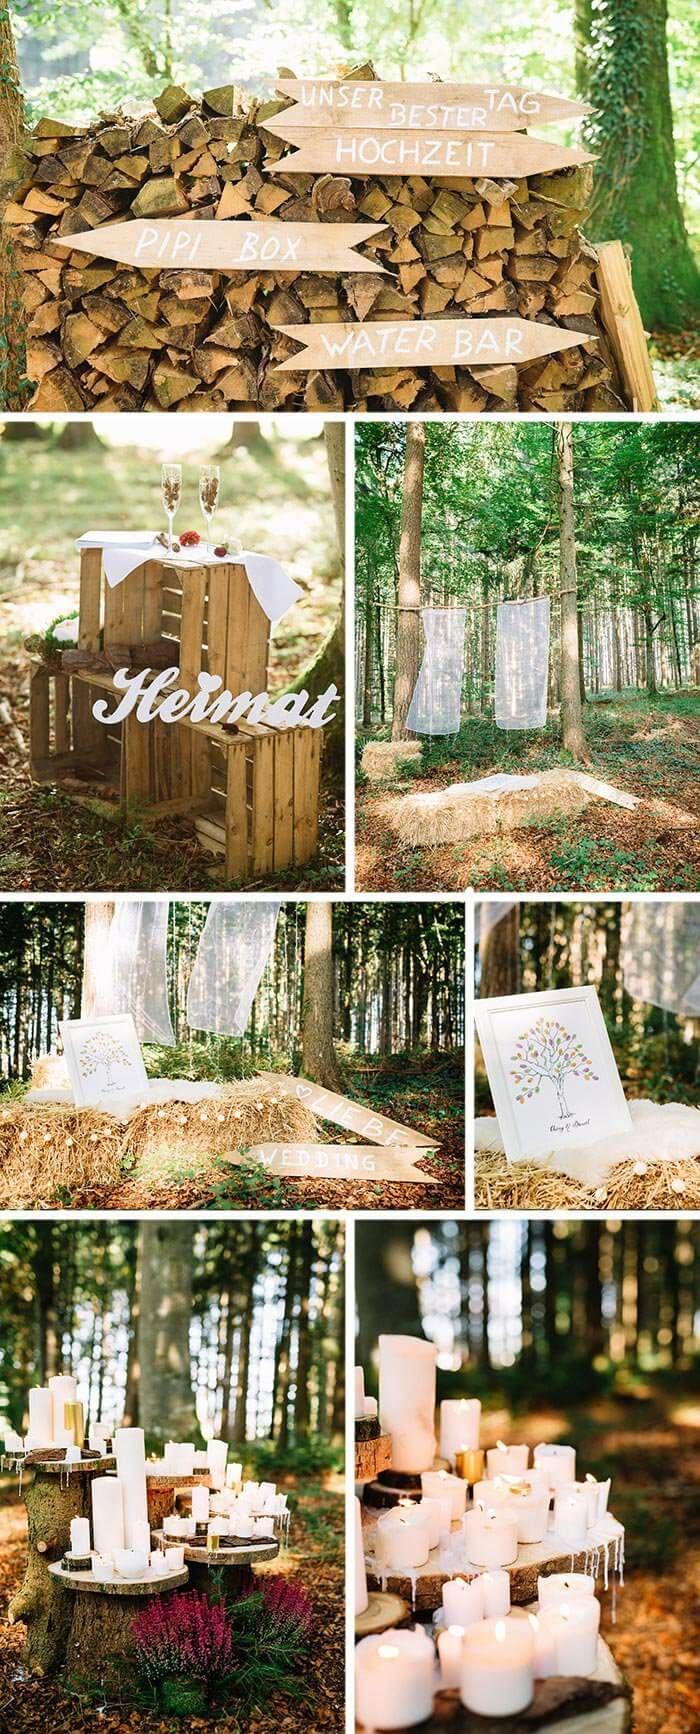 hochzeit im gr nen ideen f r eure rustikale naturhochzeit. Black Bedroom Furniture Sets. Home Design Ideas